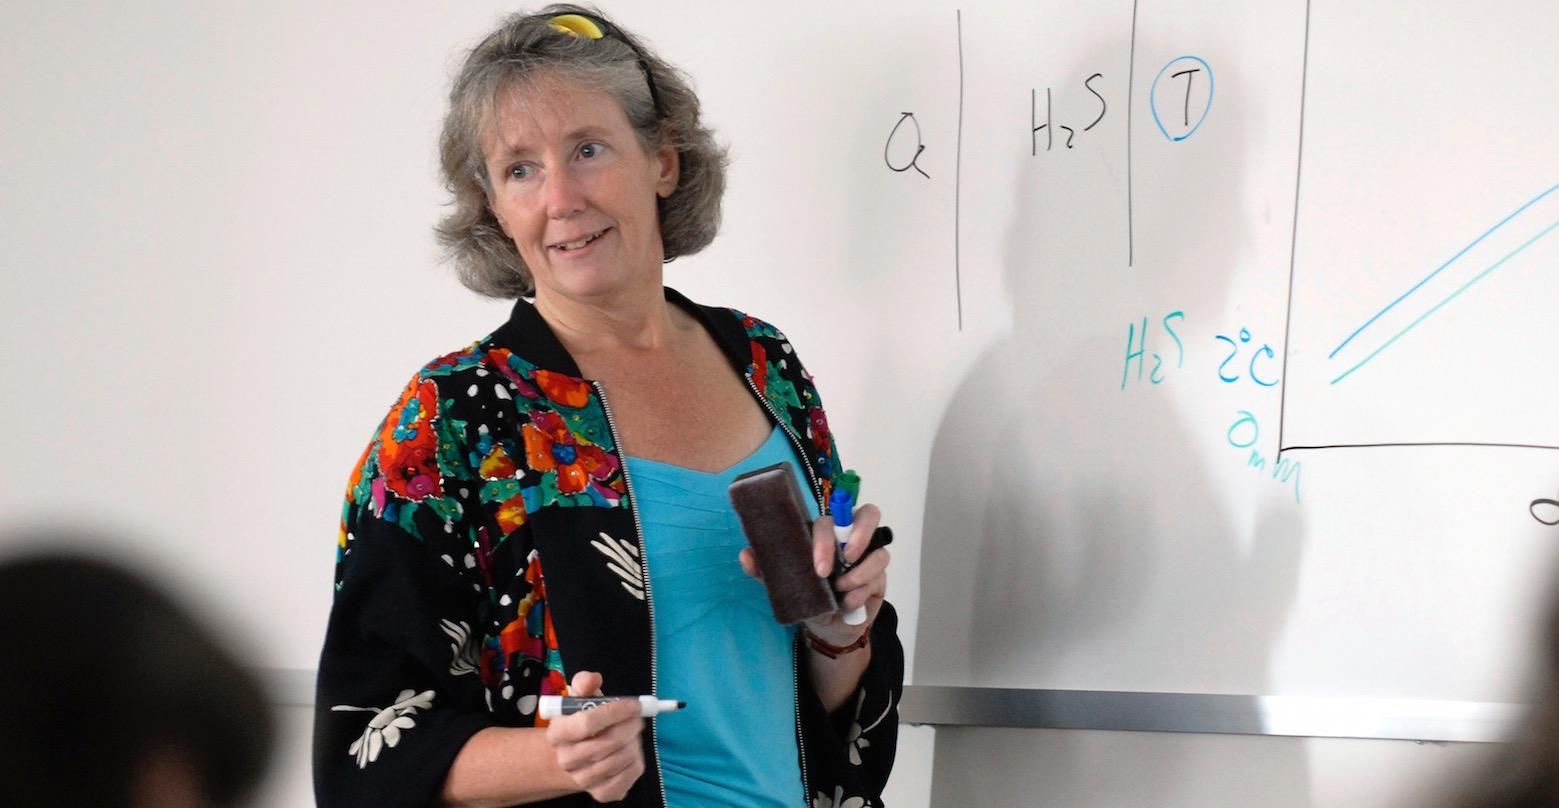 Pr Cindy Lee van Dover (Duke University), docteur honoris causa UCL 2017.